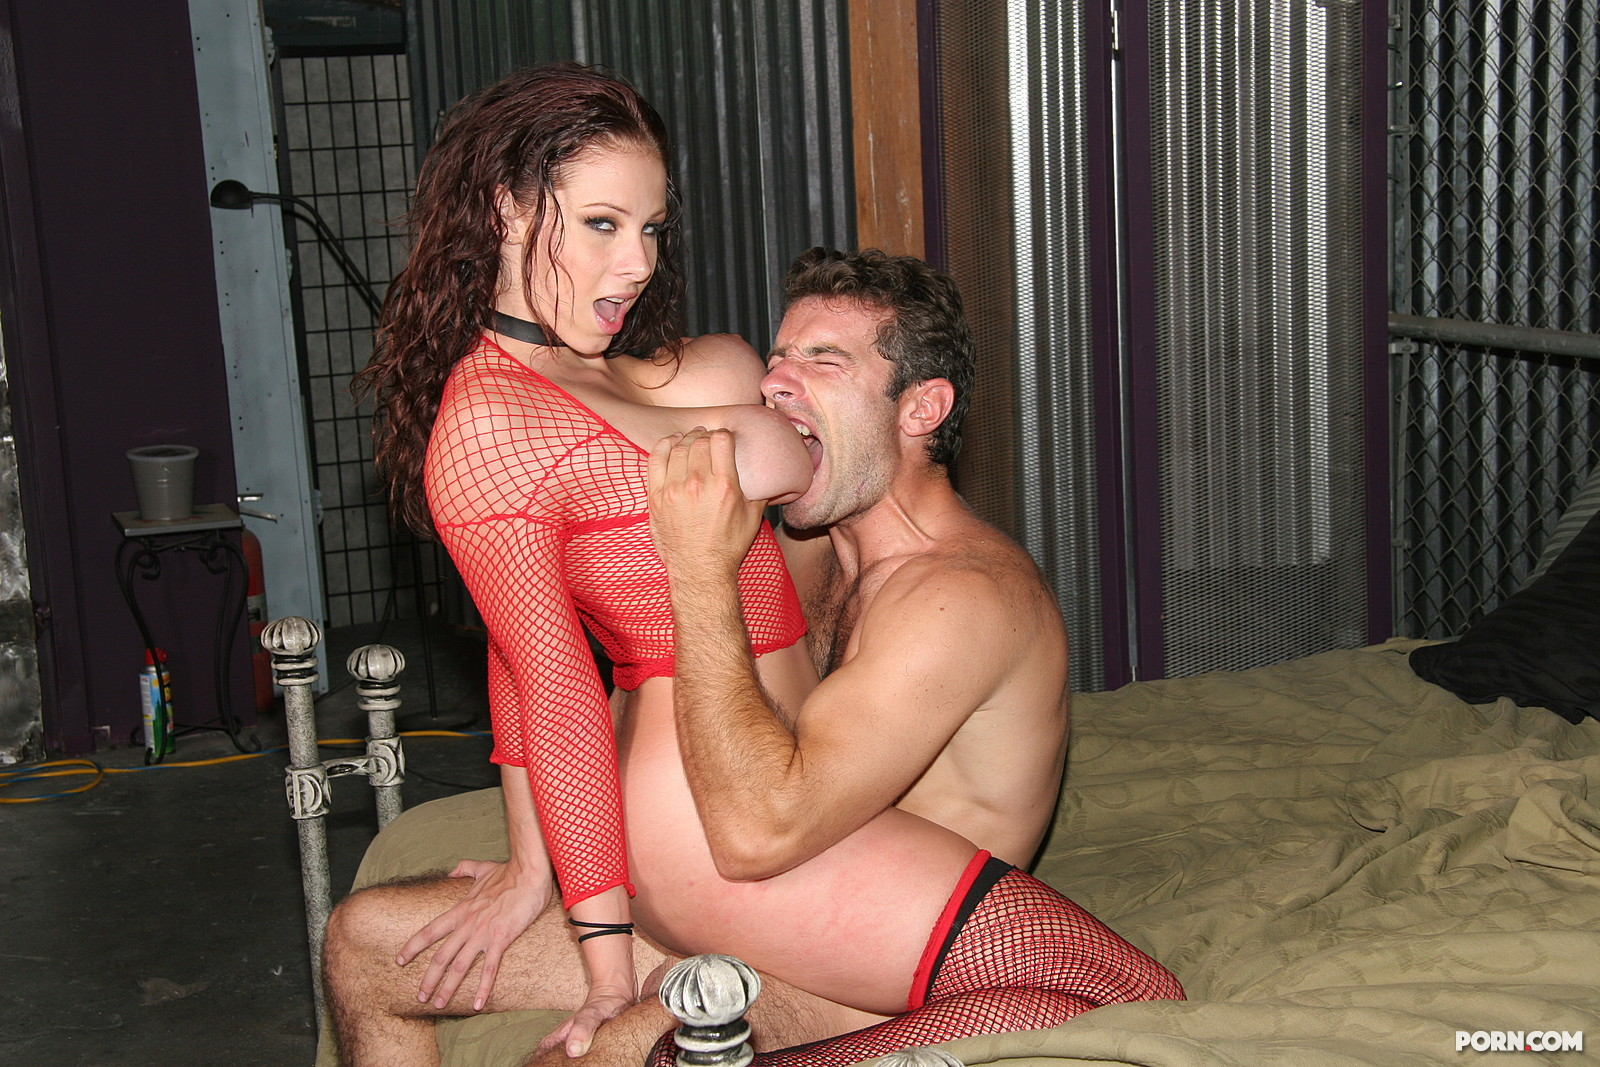 Рабыни ублажают хозяина порно онлайн 3 фотография